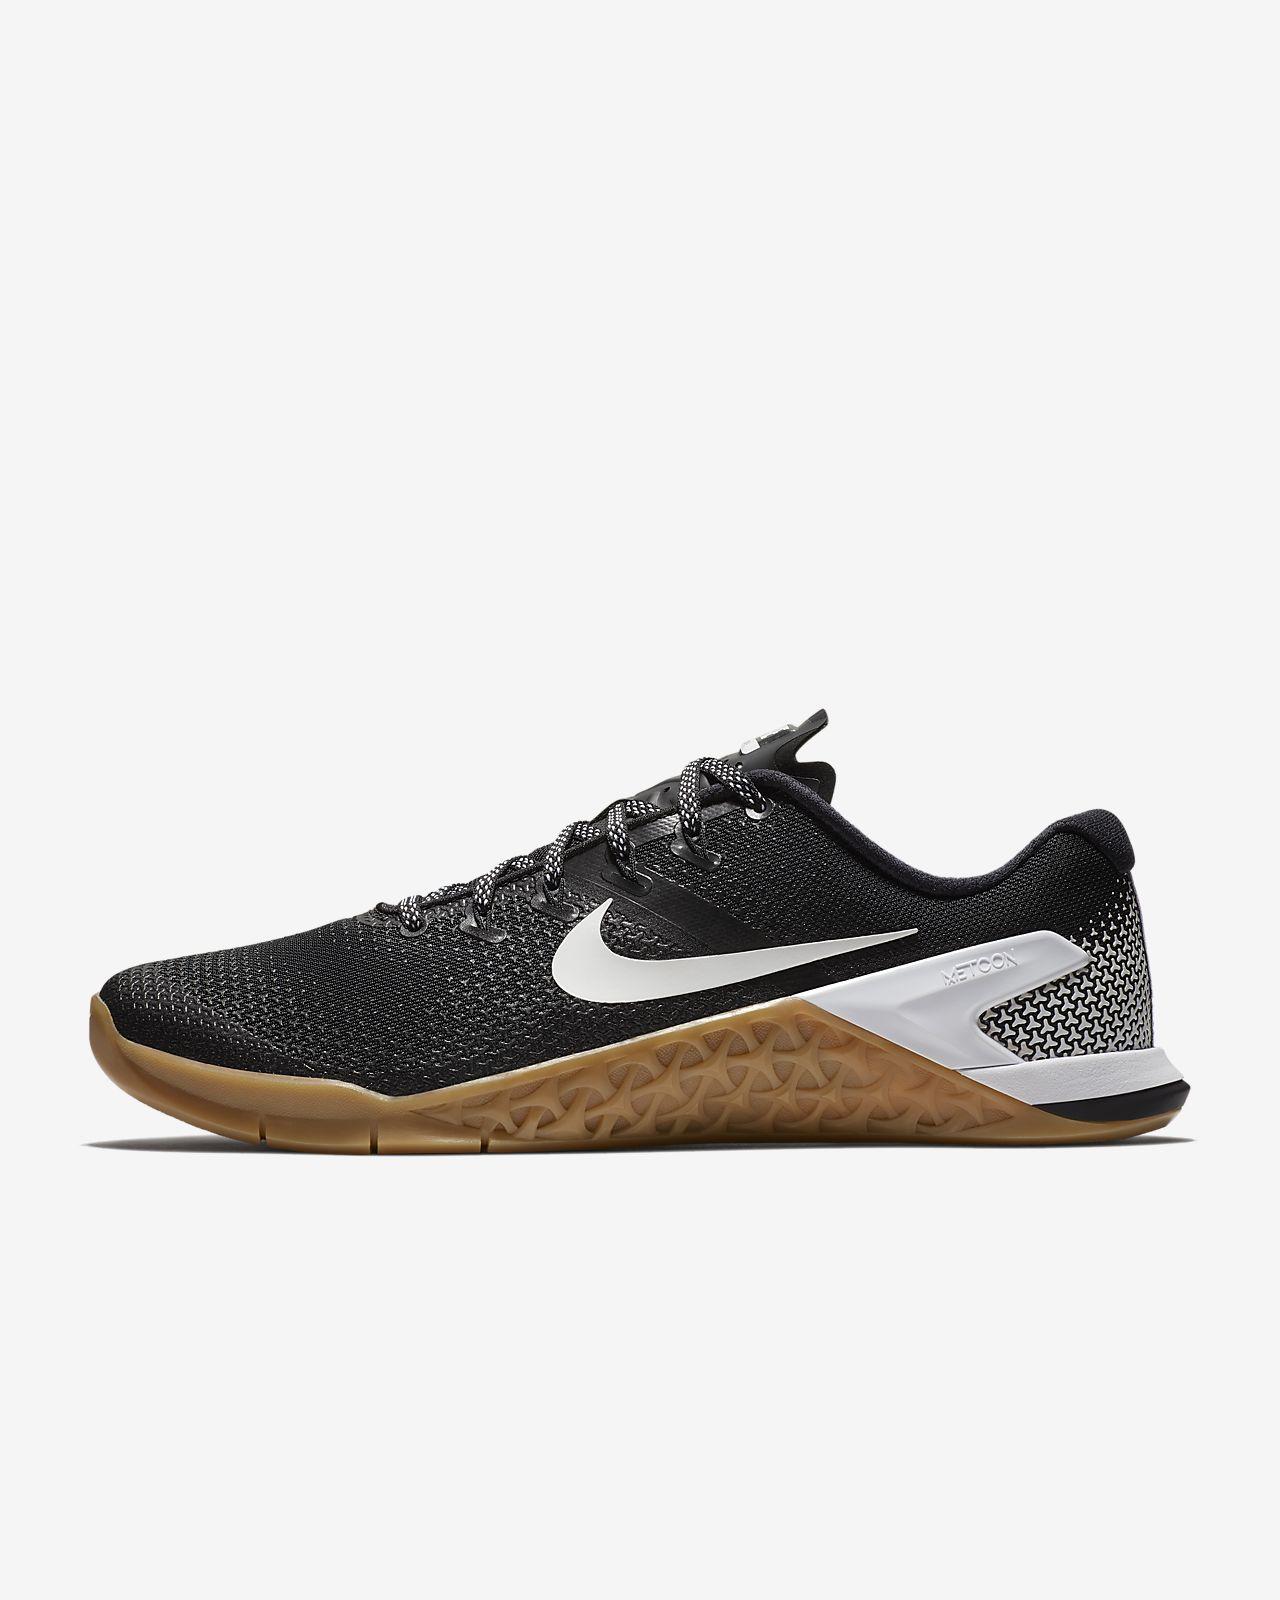 ab67435323809 Nike Metcon 4 Men s Cross Training Weightlifting Shoe. Nike.com PT